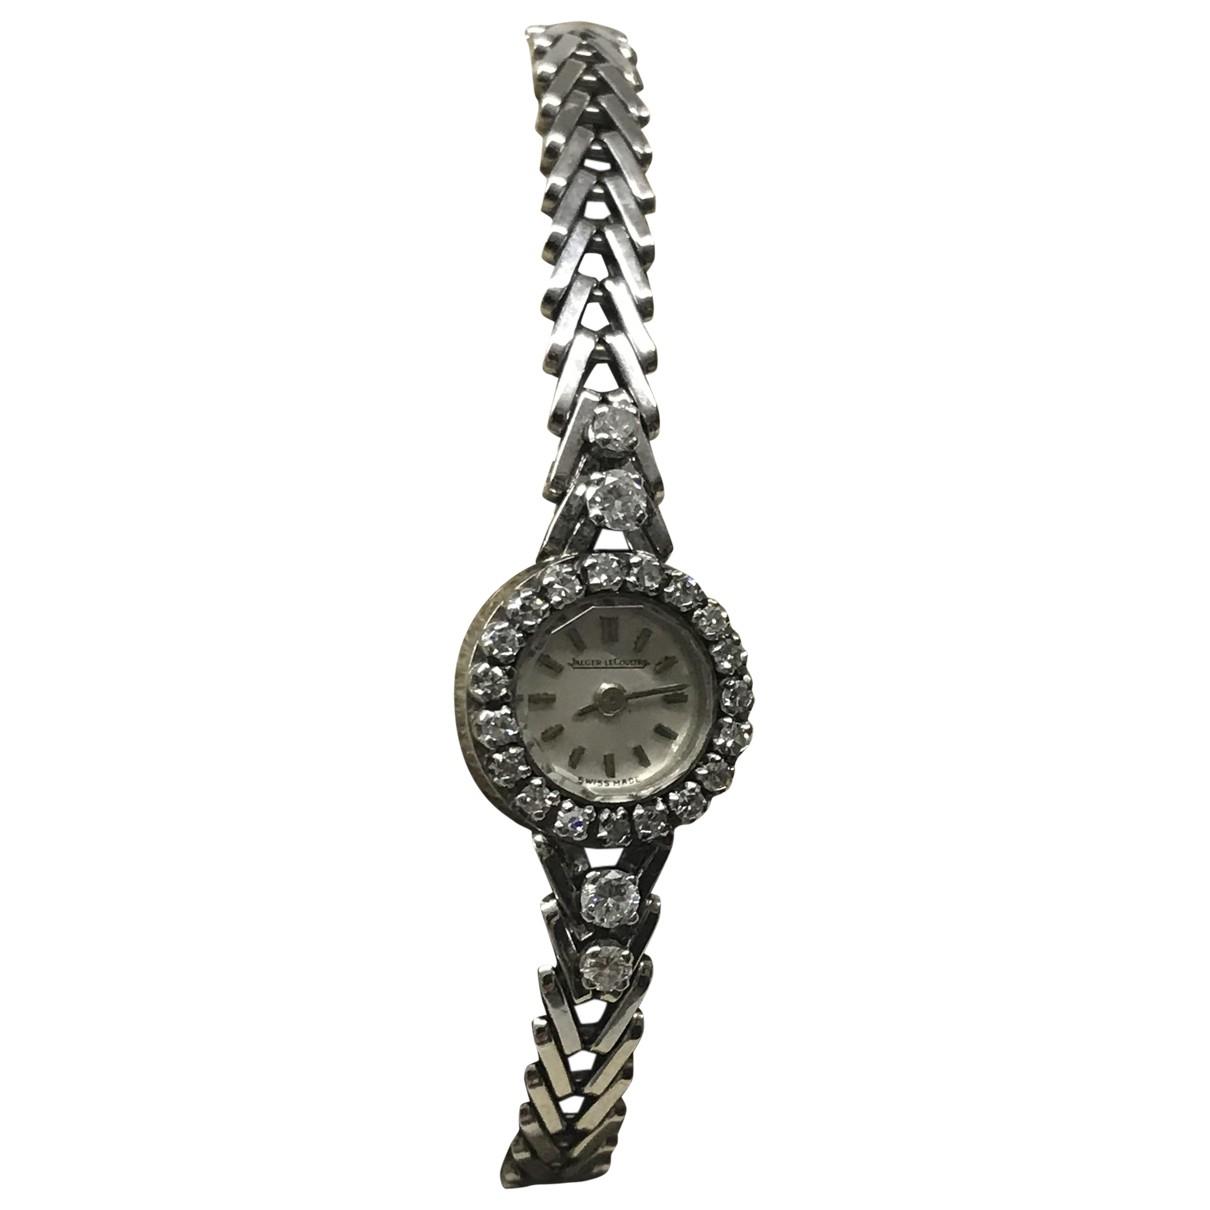 Reloj Vintage de Oro blanco Jaeger-lecoultre